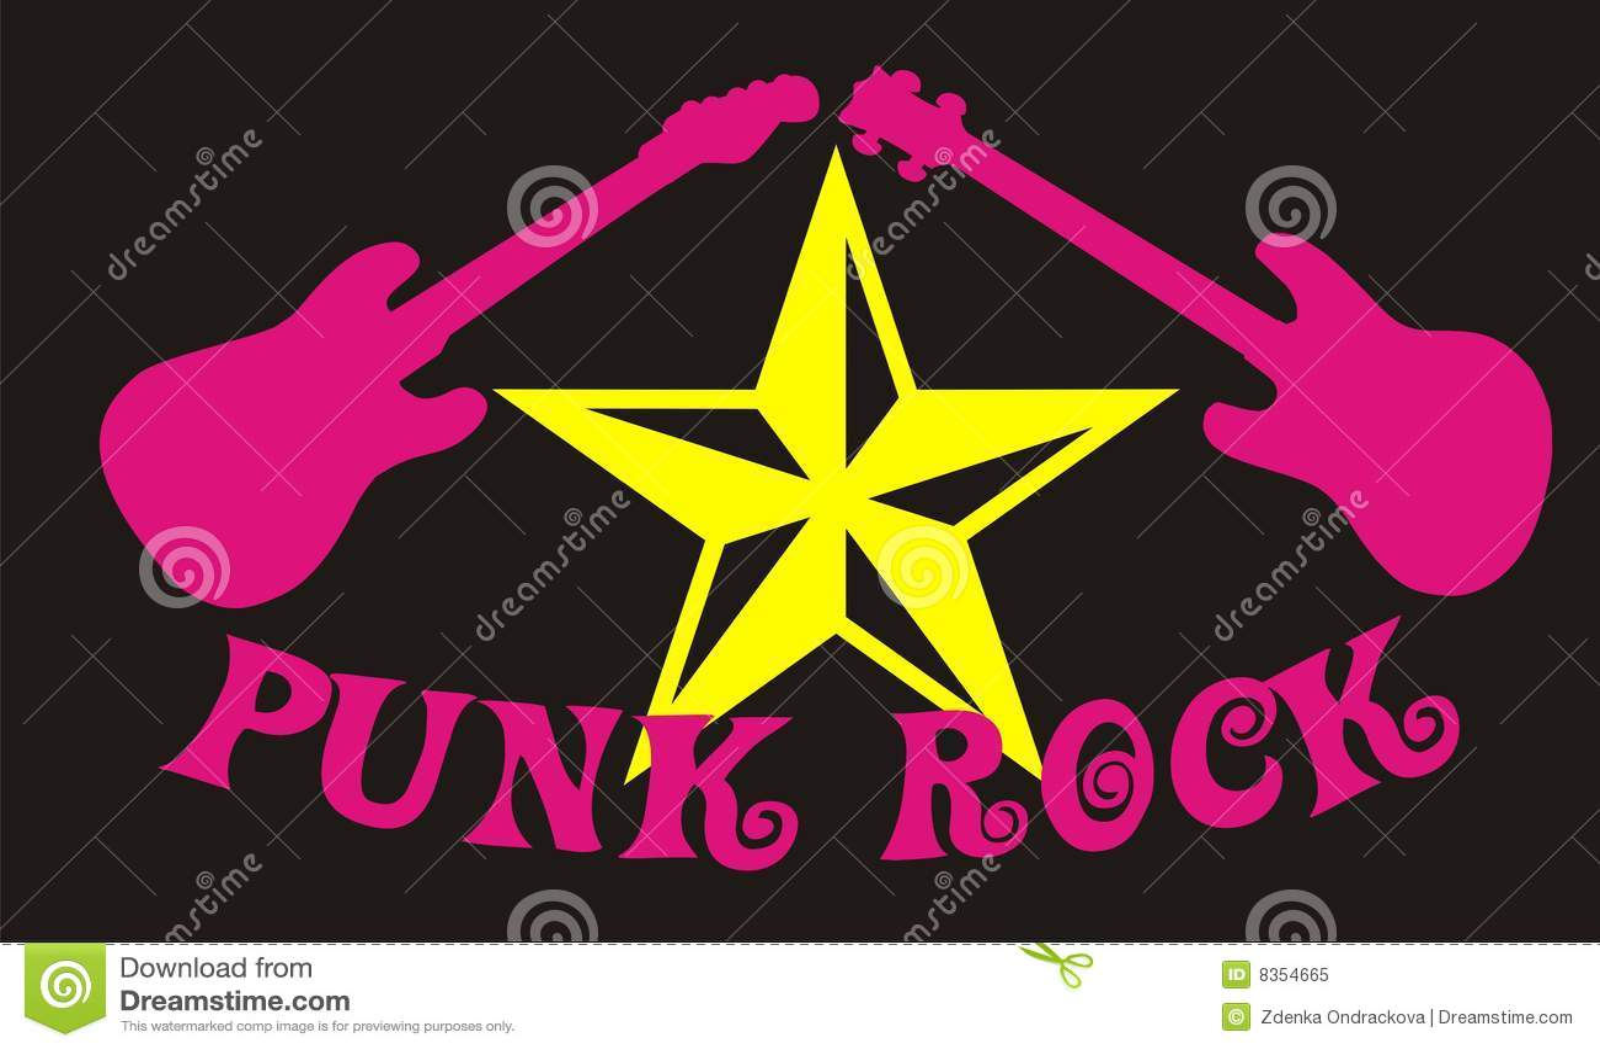 Vecteur de roche punke